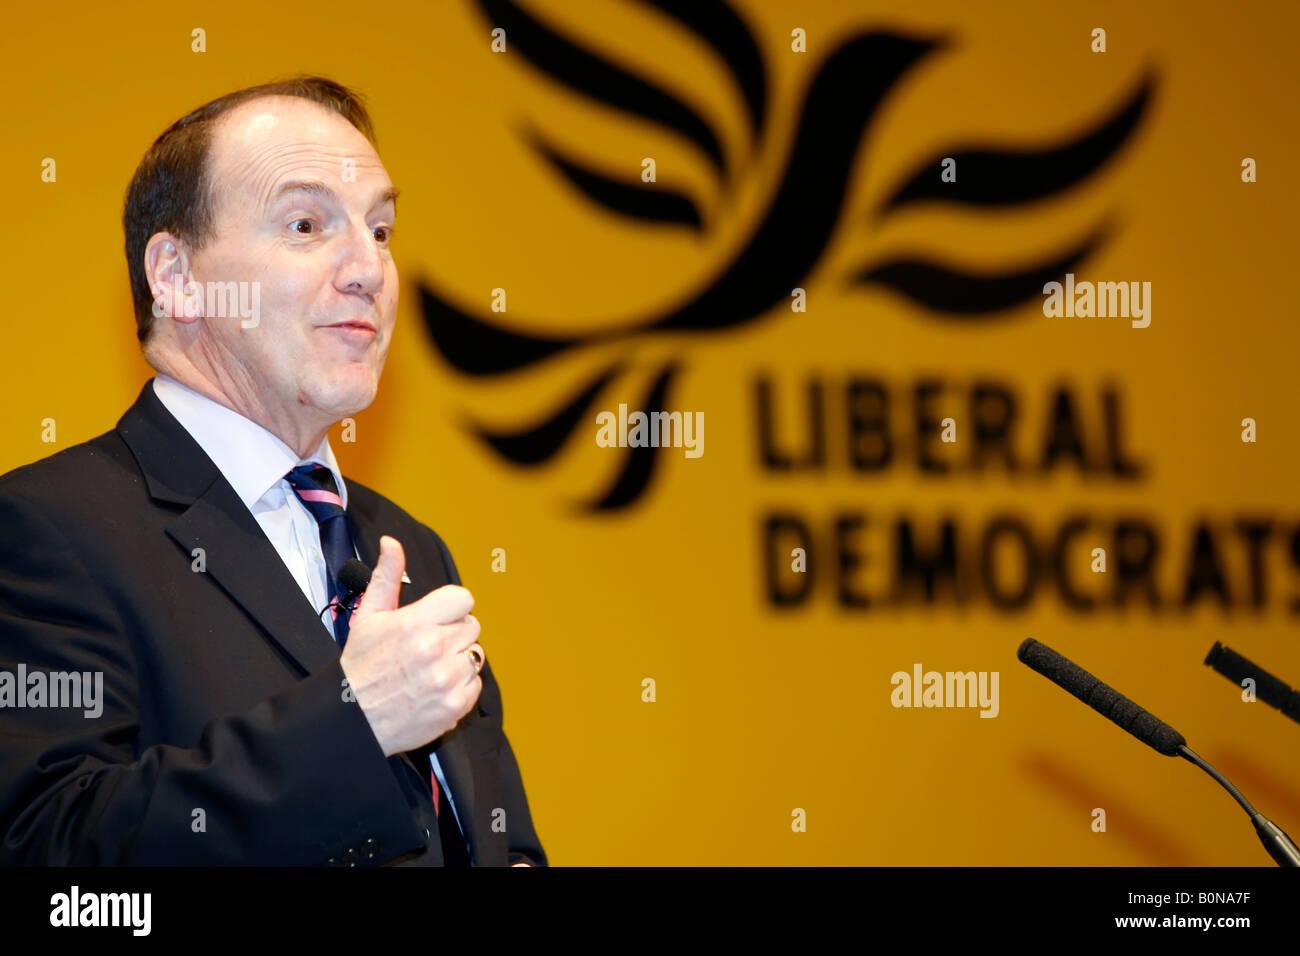 Simon Hughes MP, President of the Liberal Democrats, addressing the Liberal Democrat Spring Conference - Stock Image